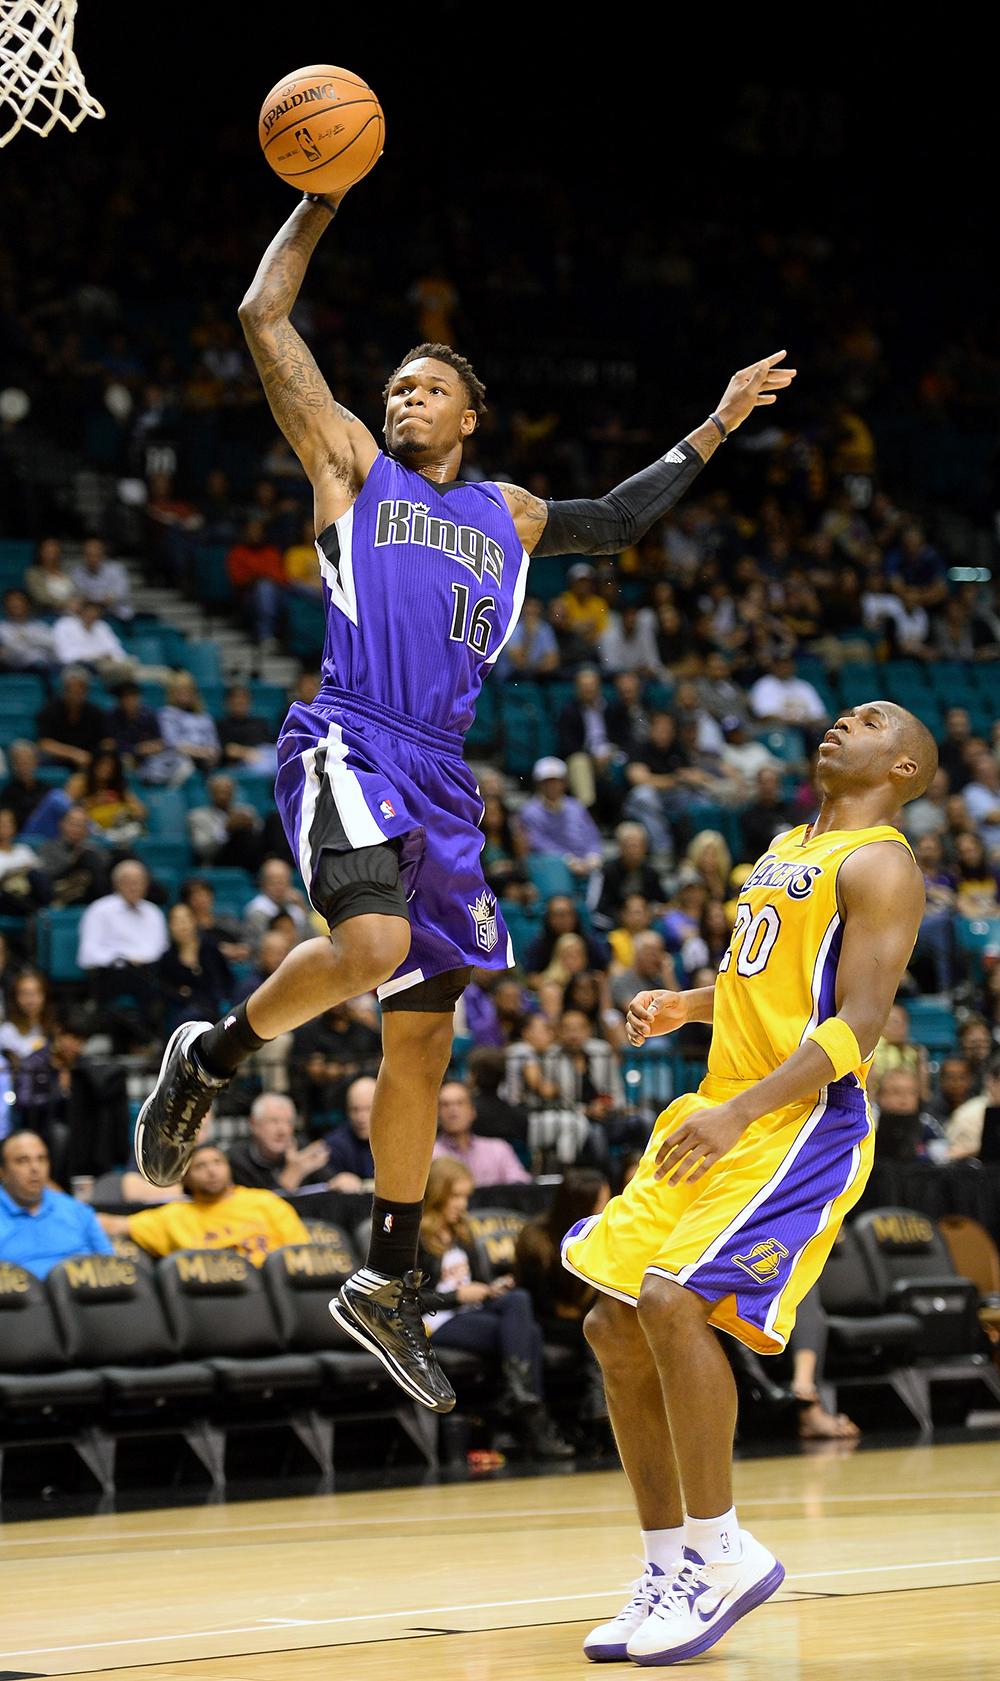 Ben McLemore  jugador de basquetbol en viva basquet